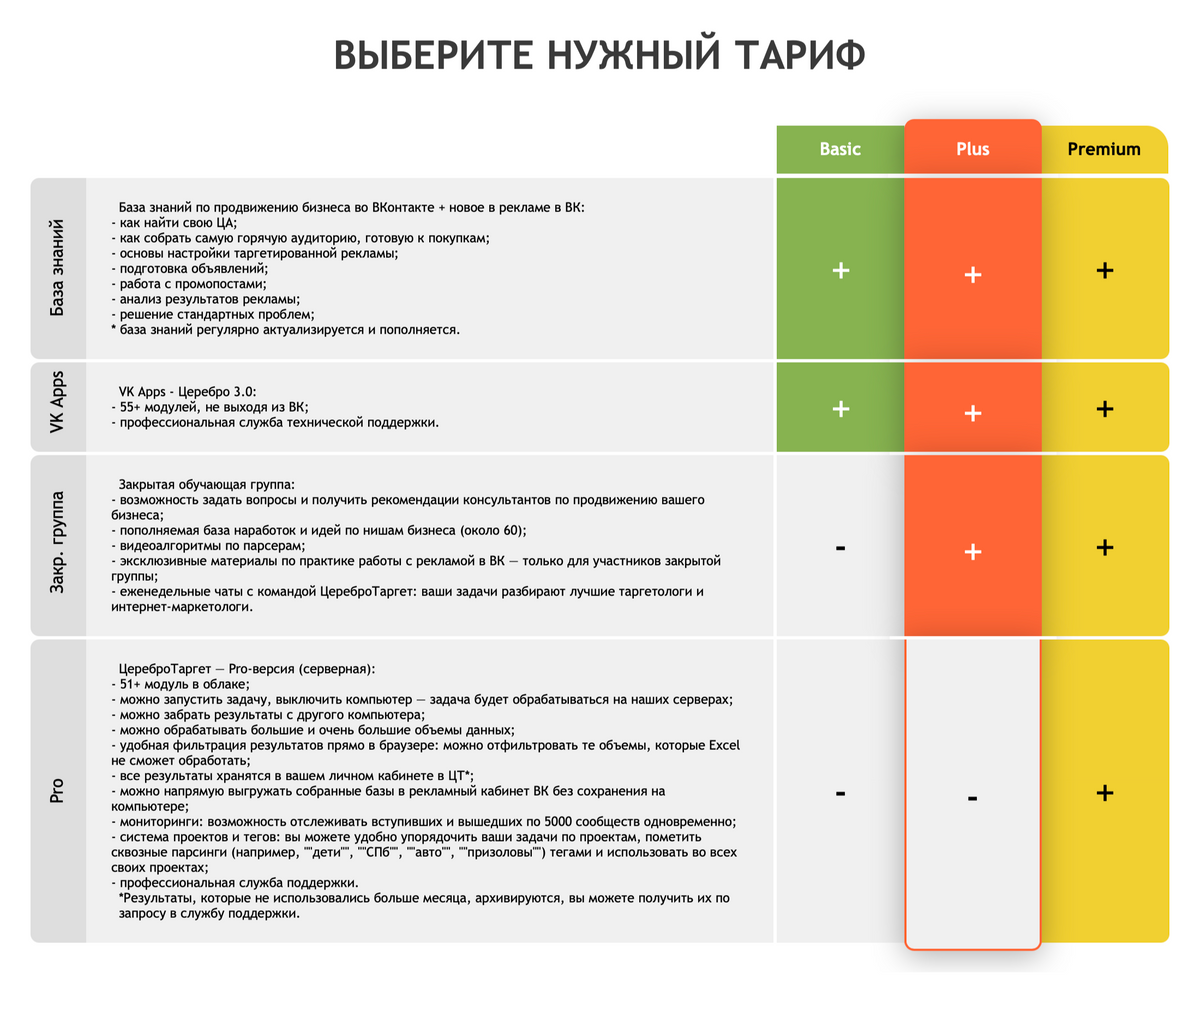 Премиум-аккаунт в «Церебро» стоит 3750<span class=ruble>Р</span>